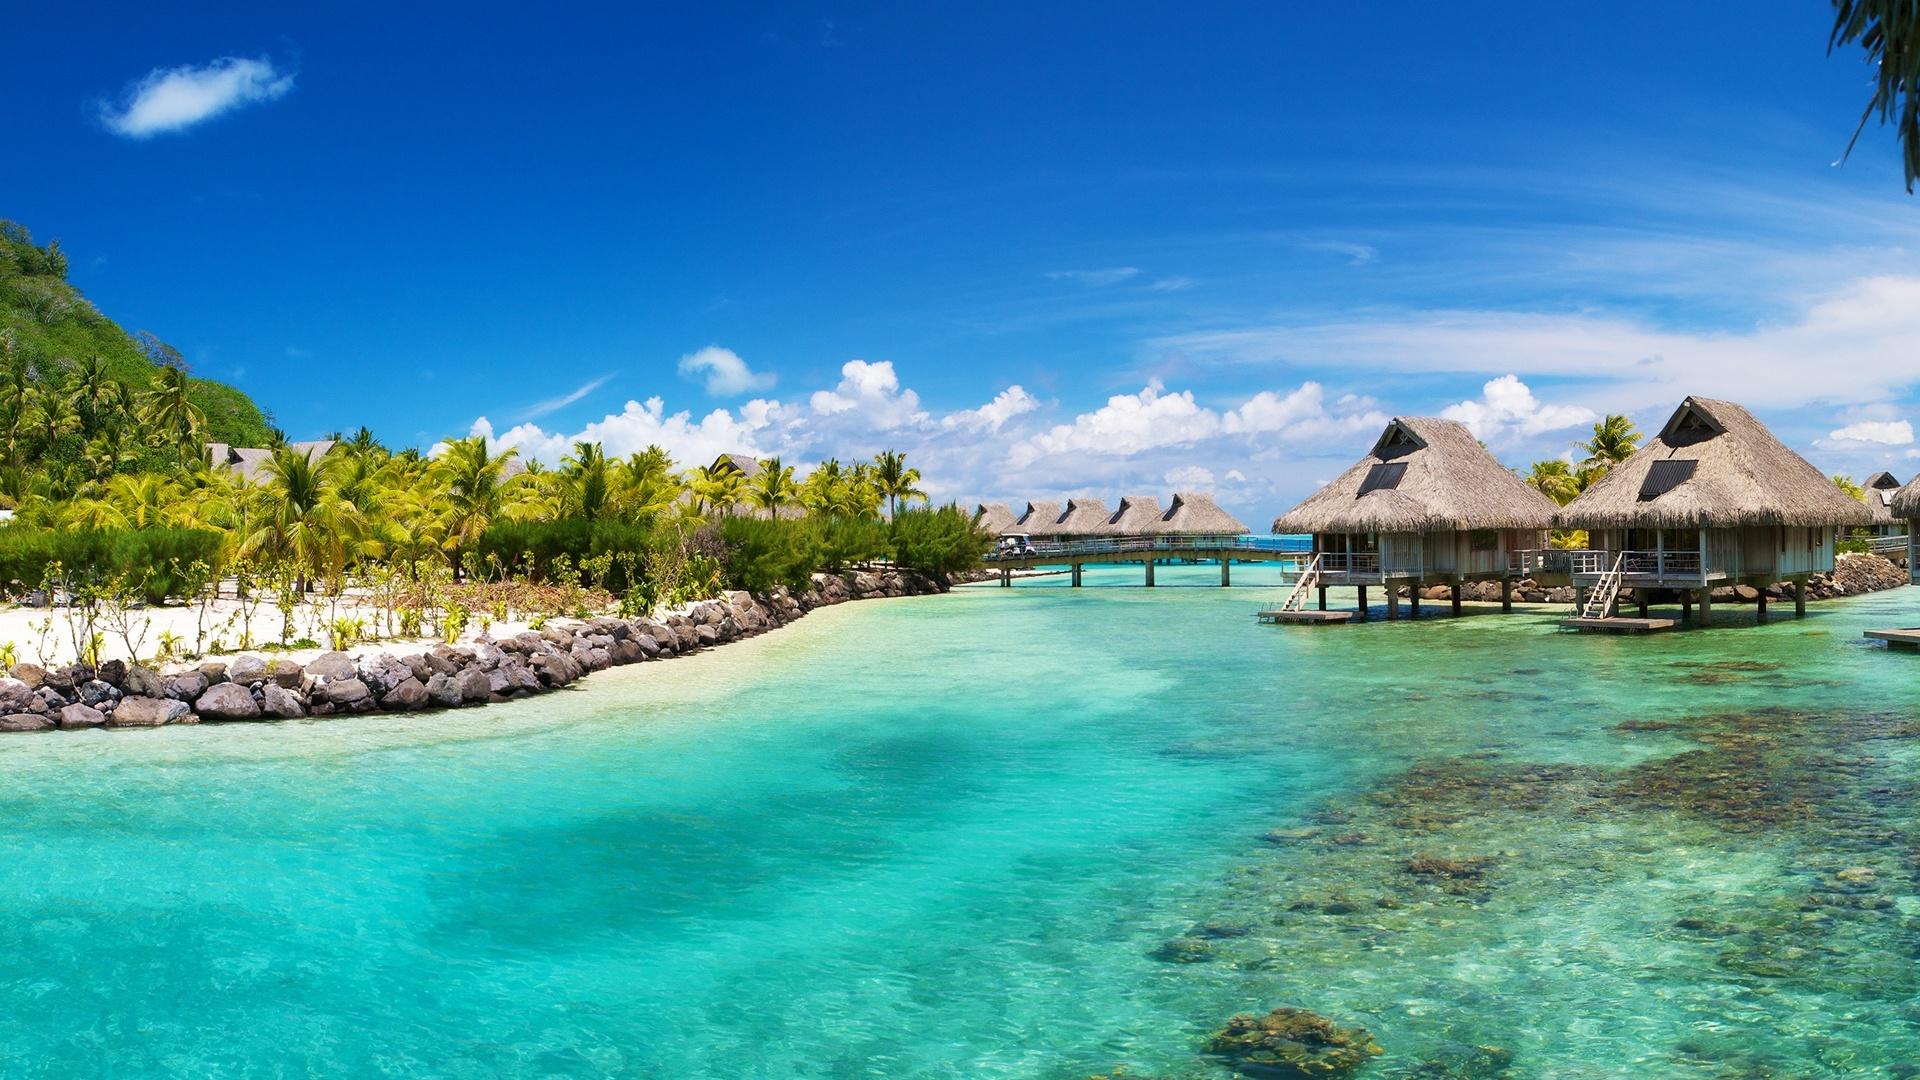 Free Download Sfondo Desktop Spiaggia Tropicale Tropical Beach Hd